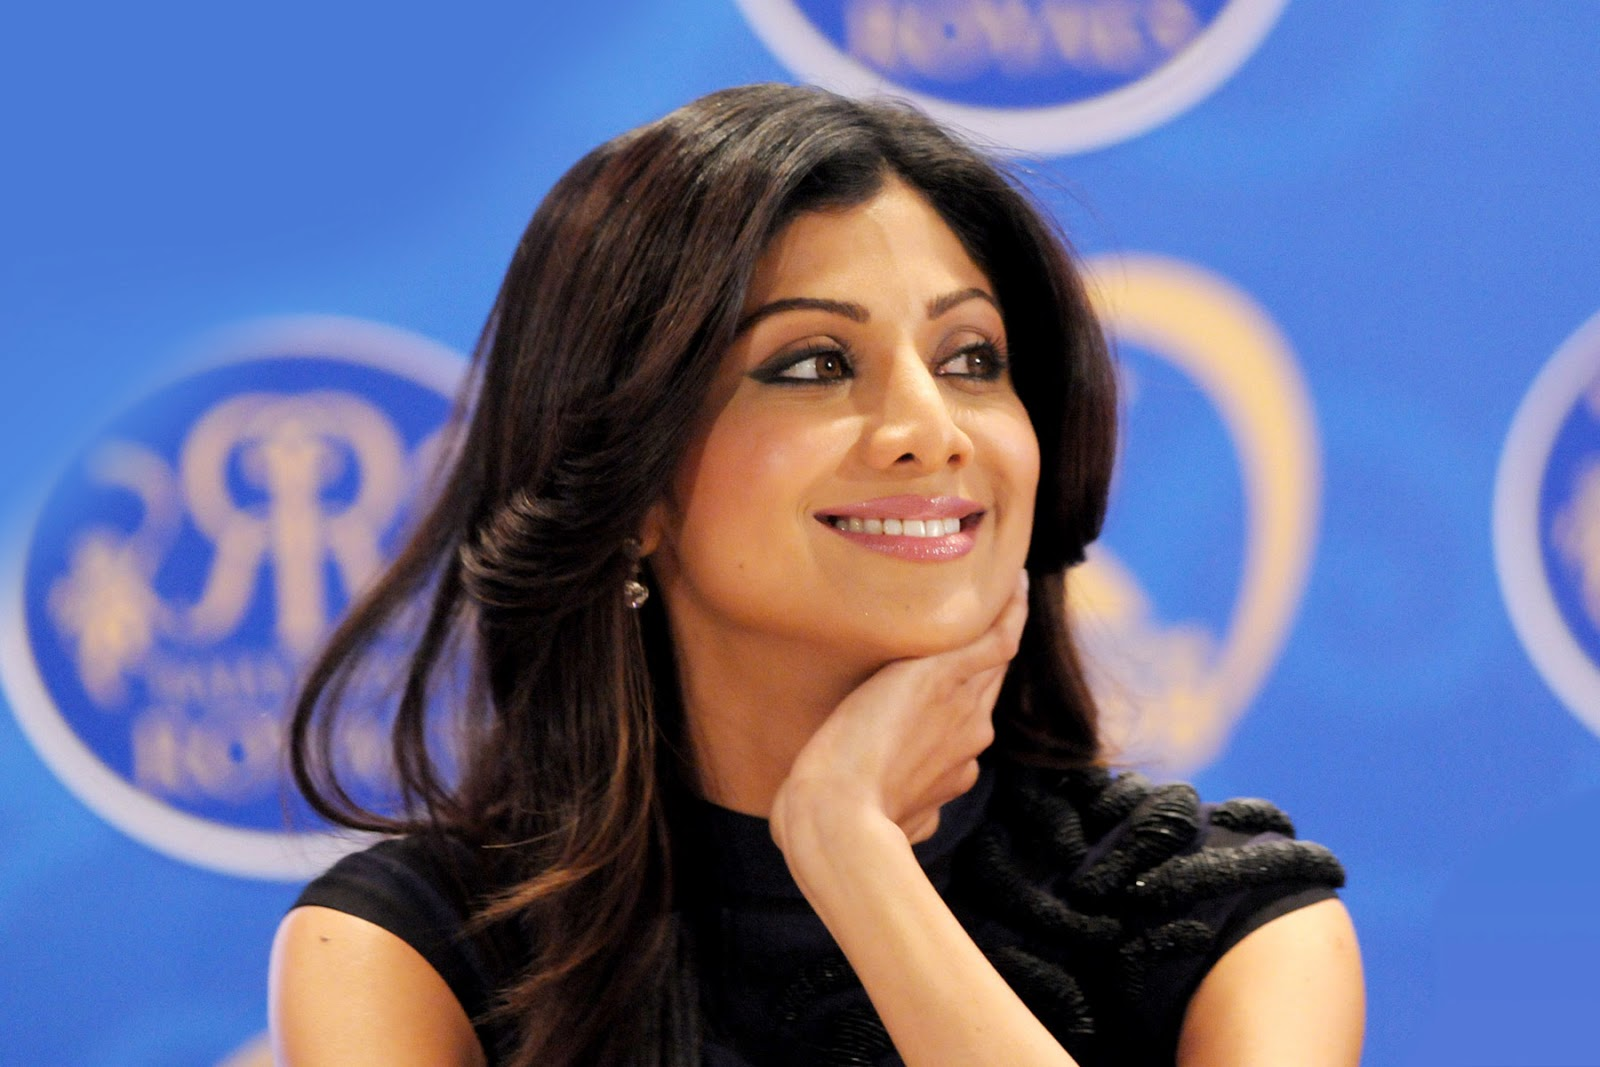 Happy Birthday to Shilpa Shetty - June 8 | HD Wallpapers ...